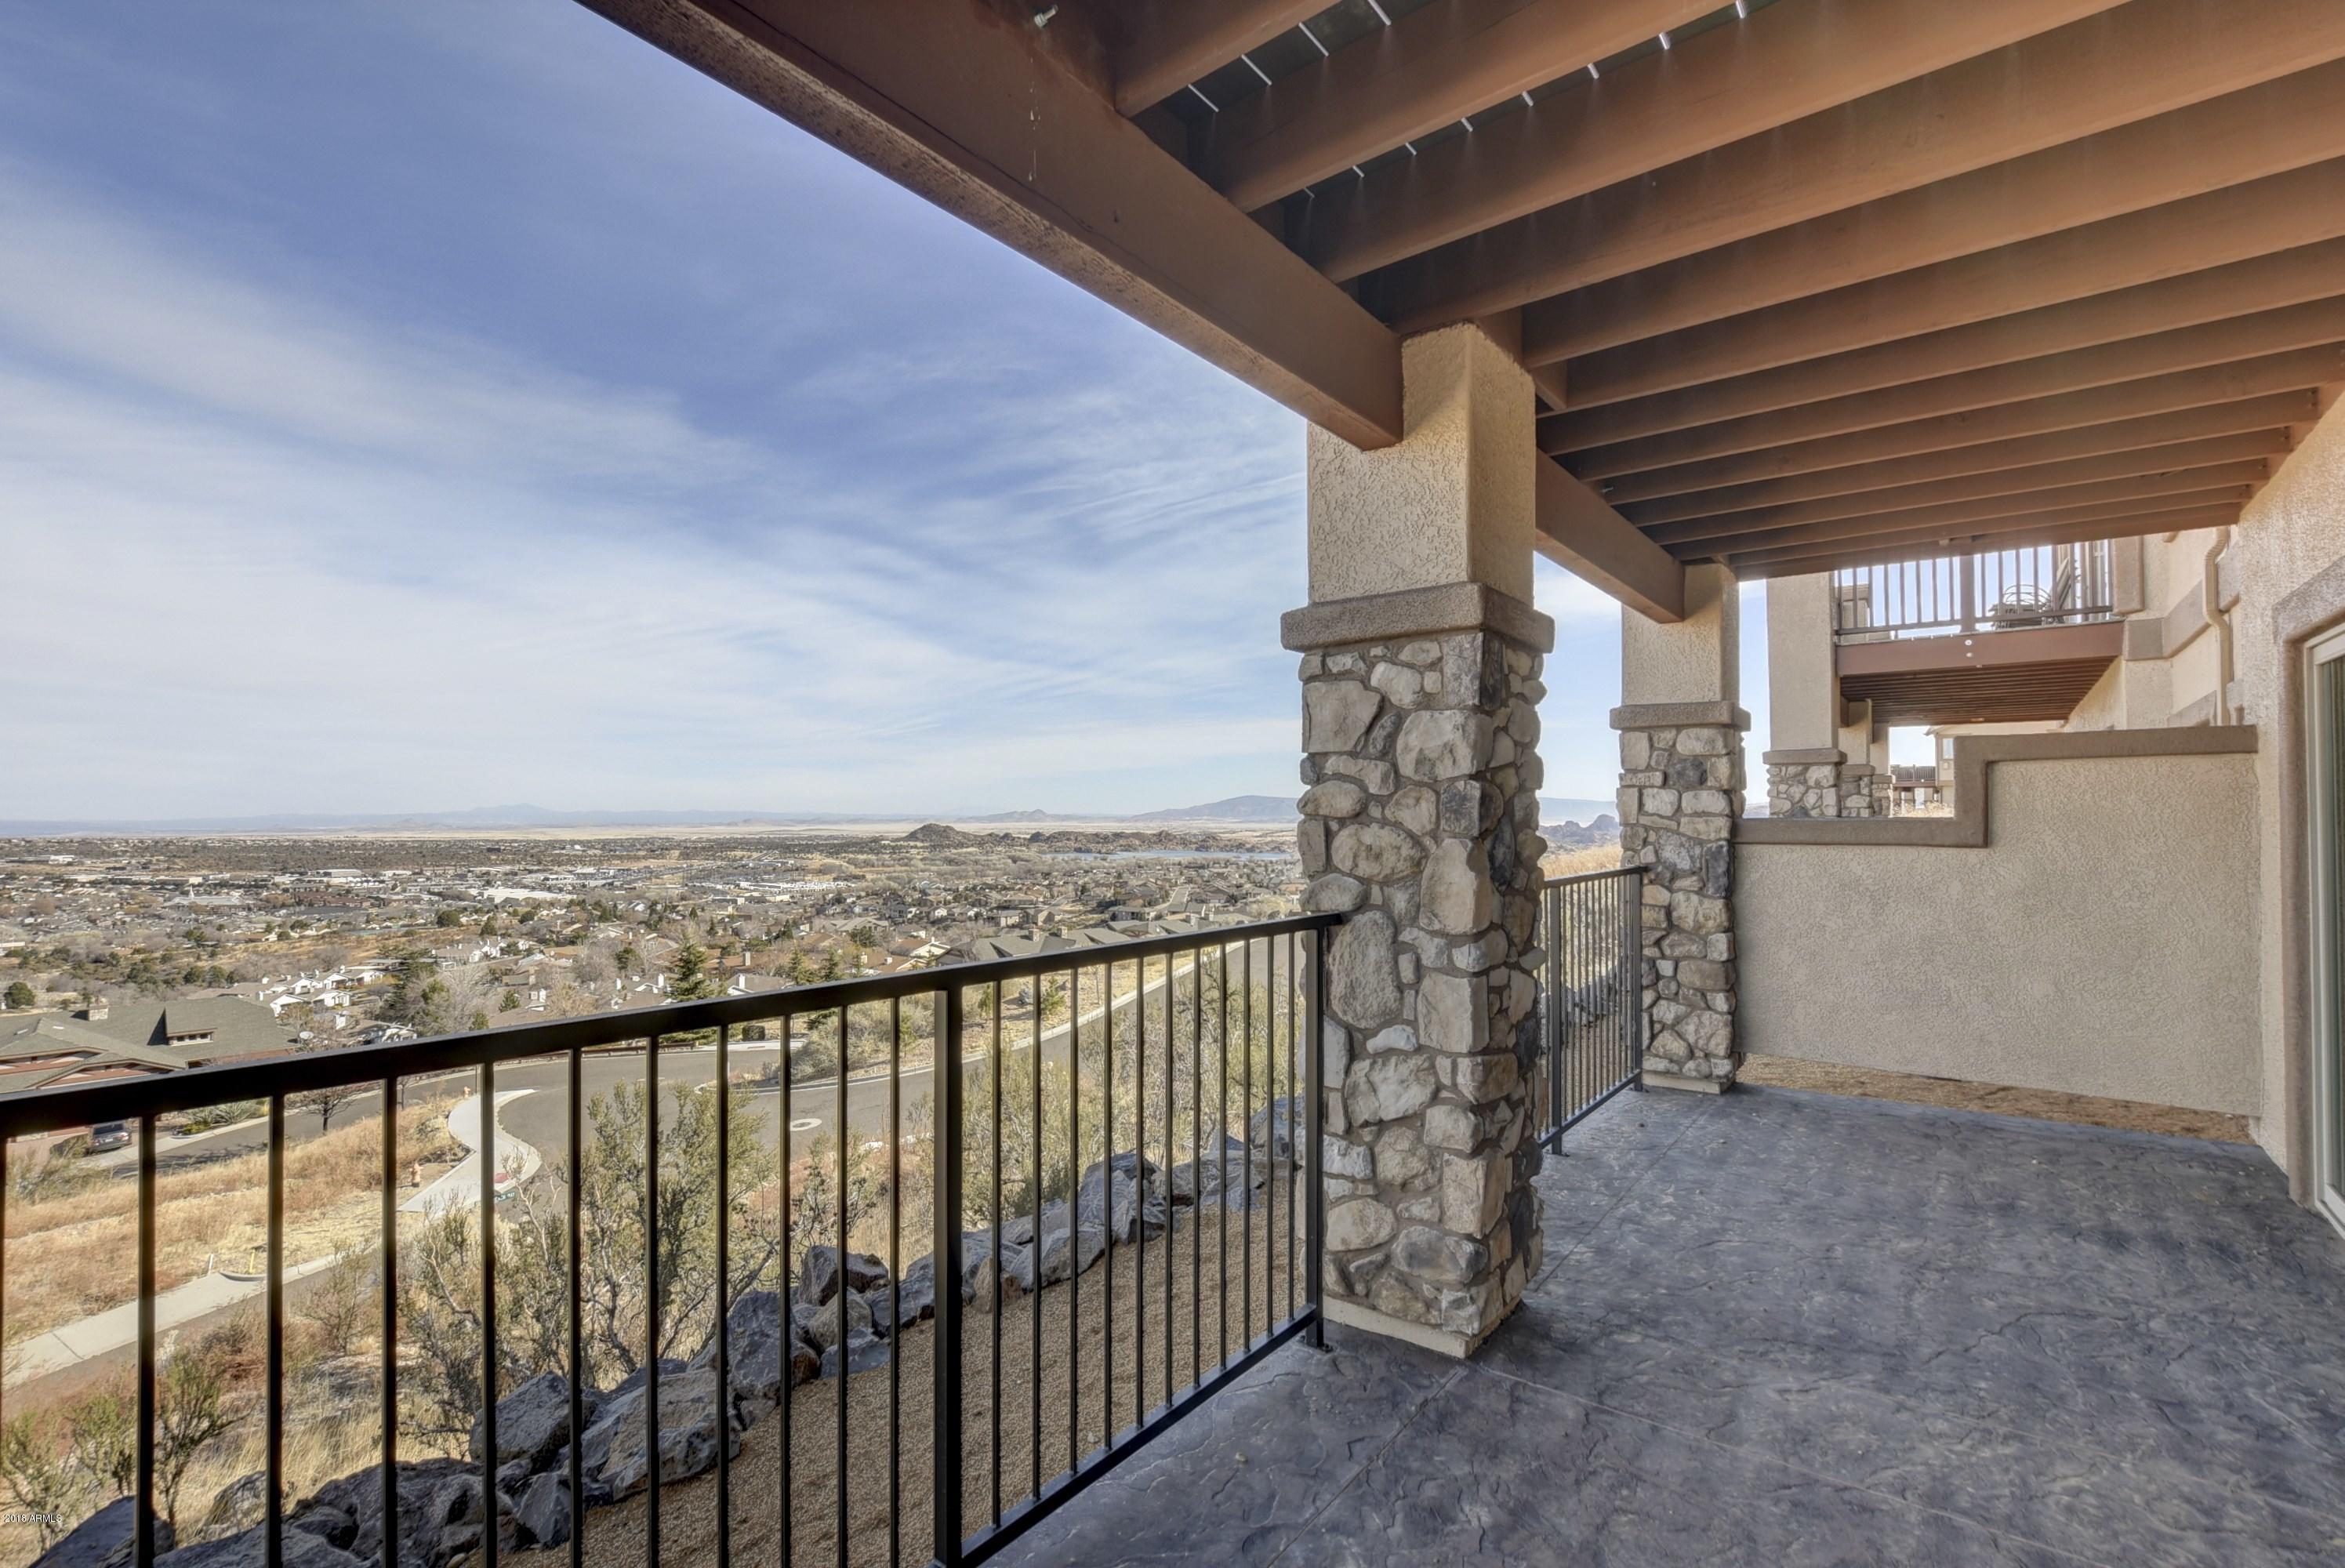 MLS 5850792 538 OSPREY Trail, Prescott, AZ Prescott AZ Condo or Townhome